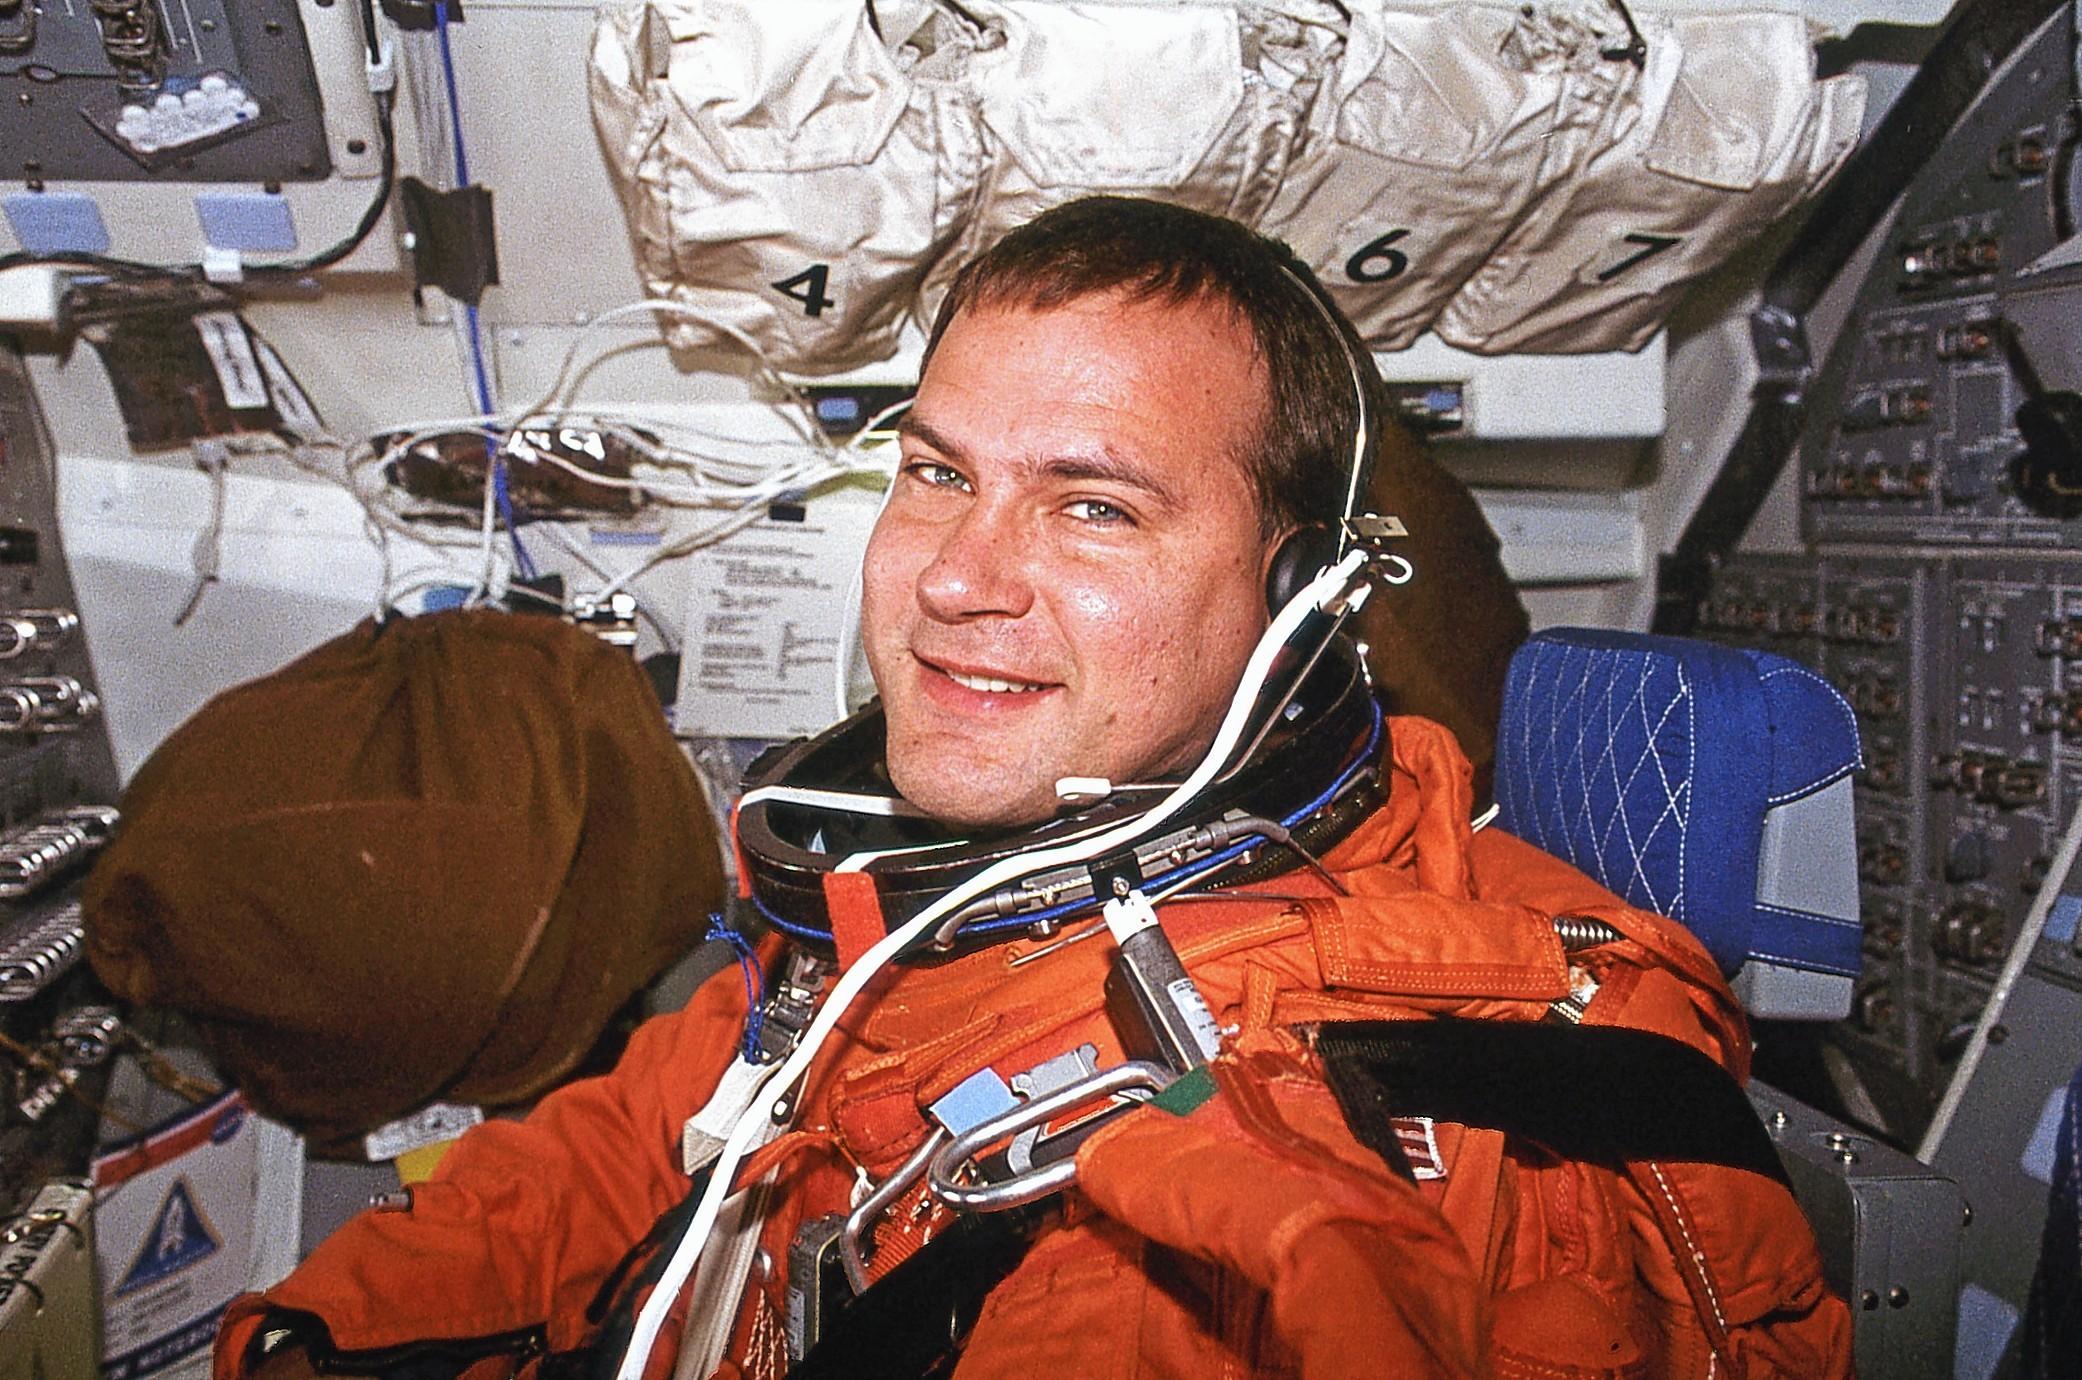 US astronaut Rick Hieb